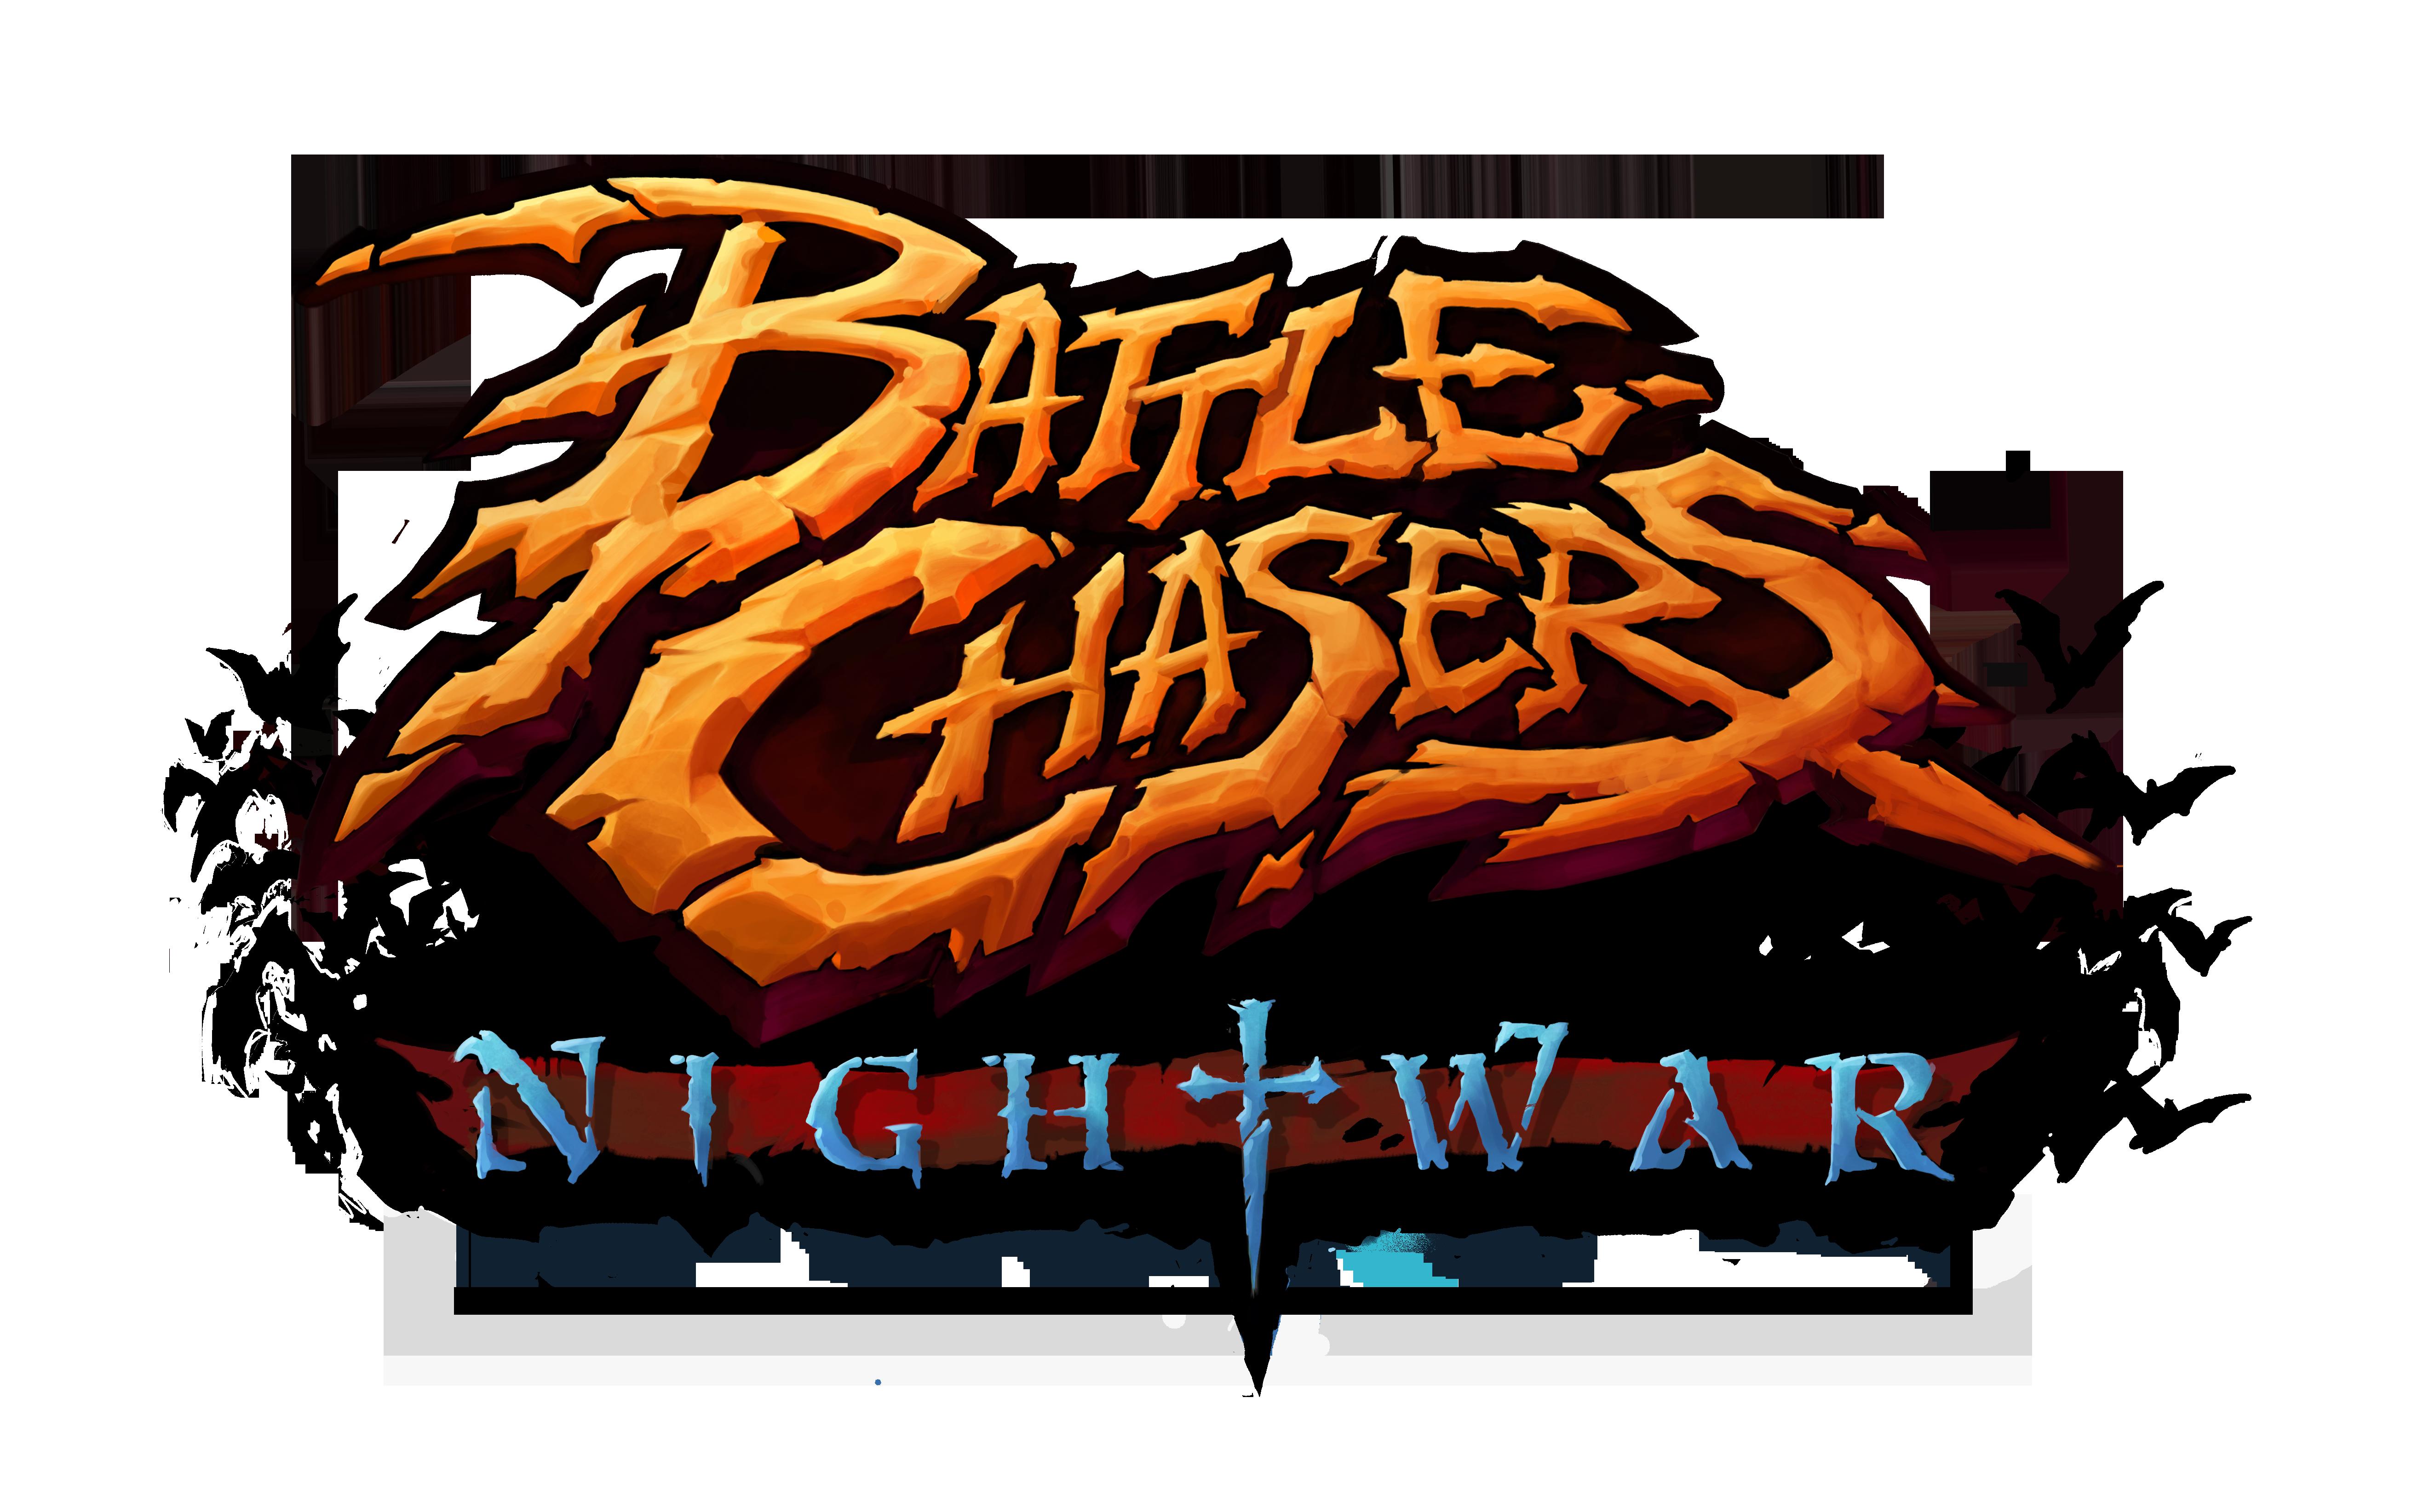 BattleChasers-Nightwar Multi Div 001